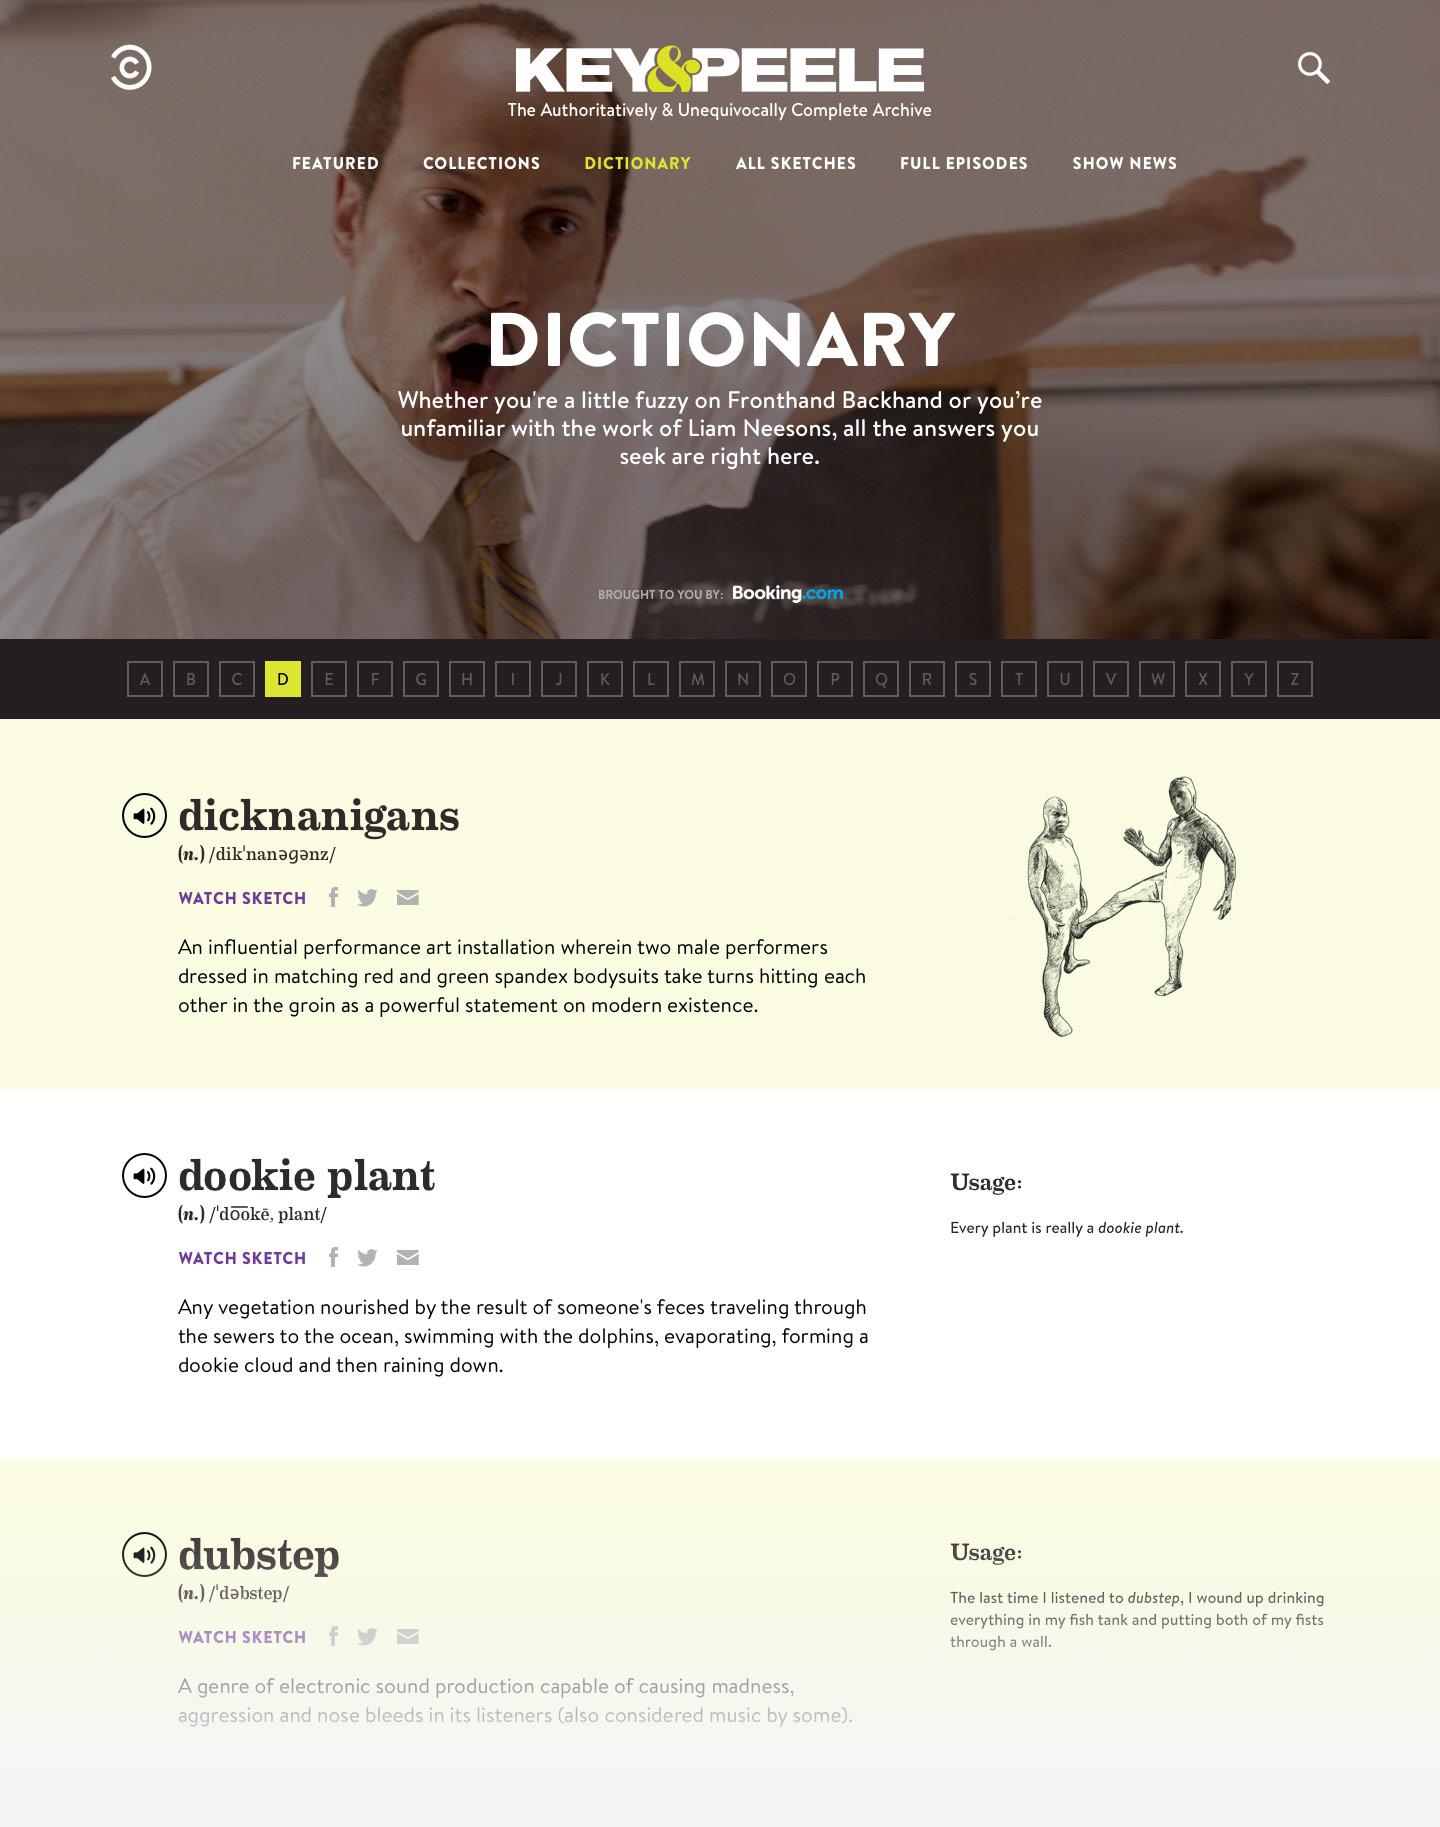 cc_04_dictionary_page_desktop.jpg